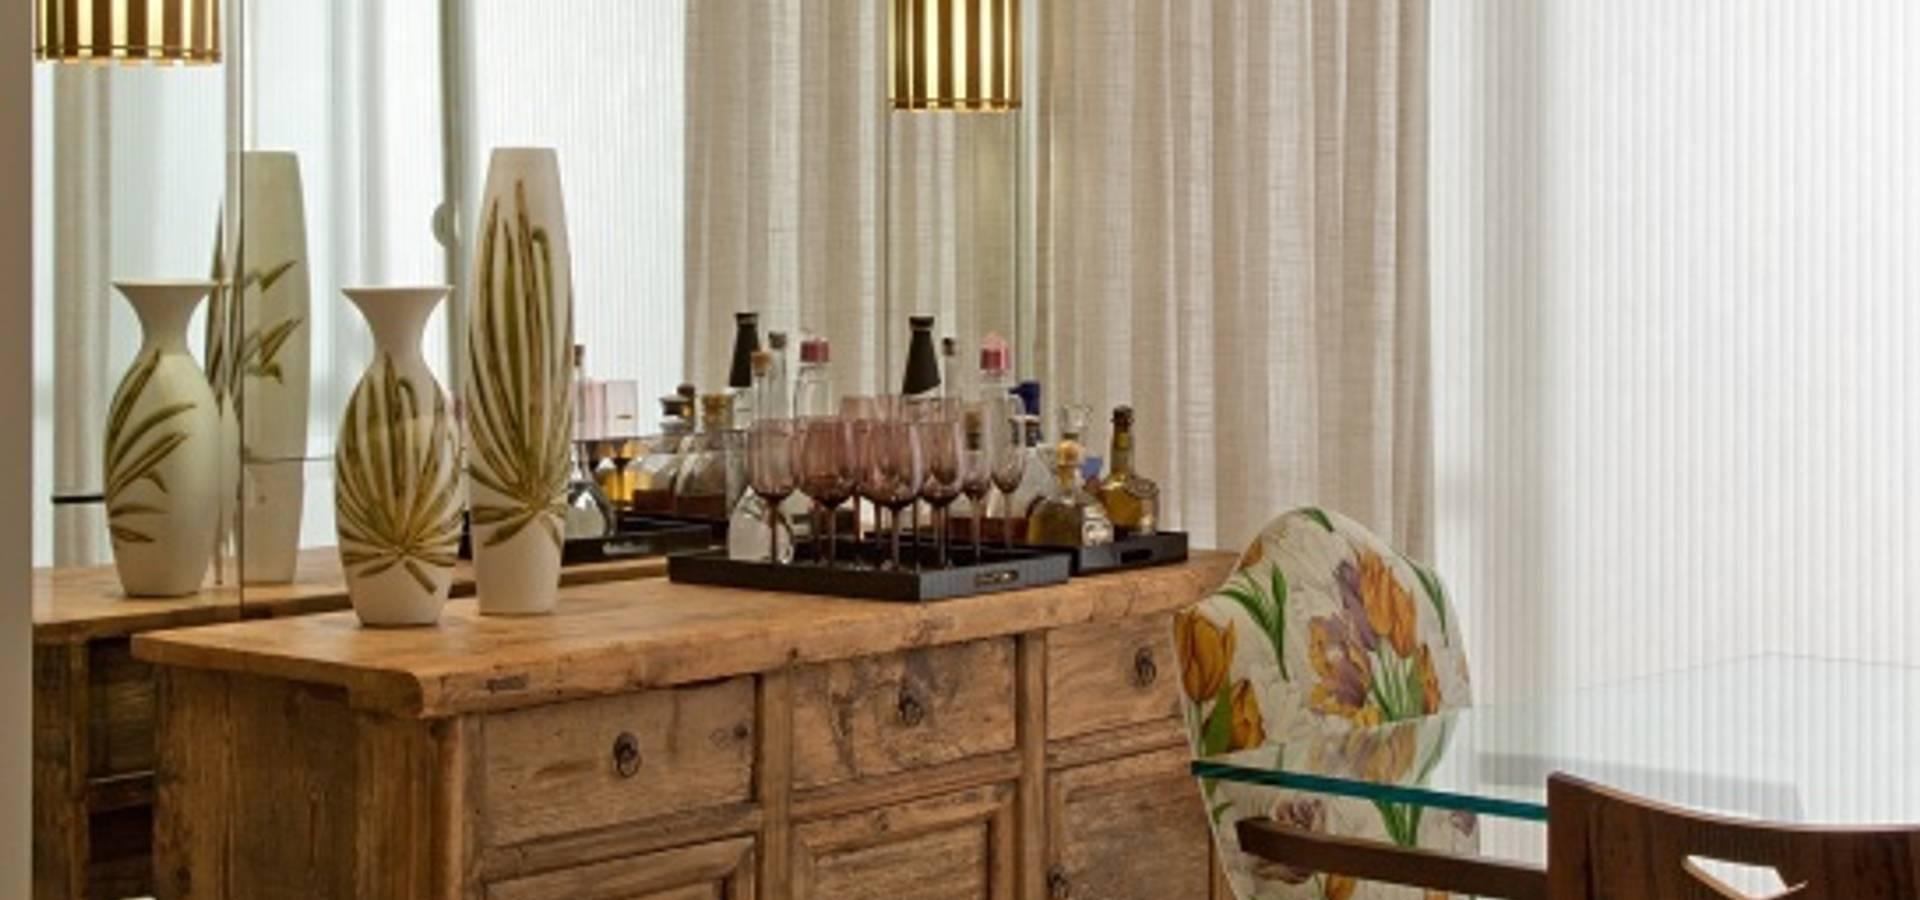 Bianka Mugnatto Design de Interiores